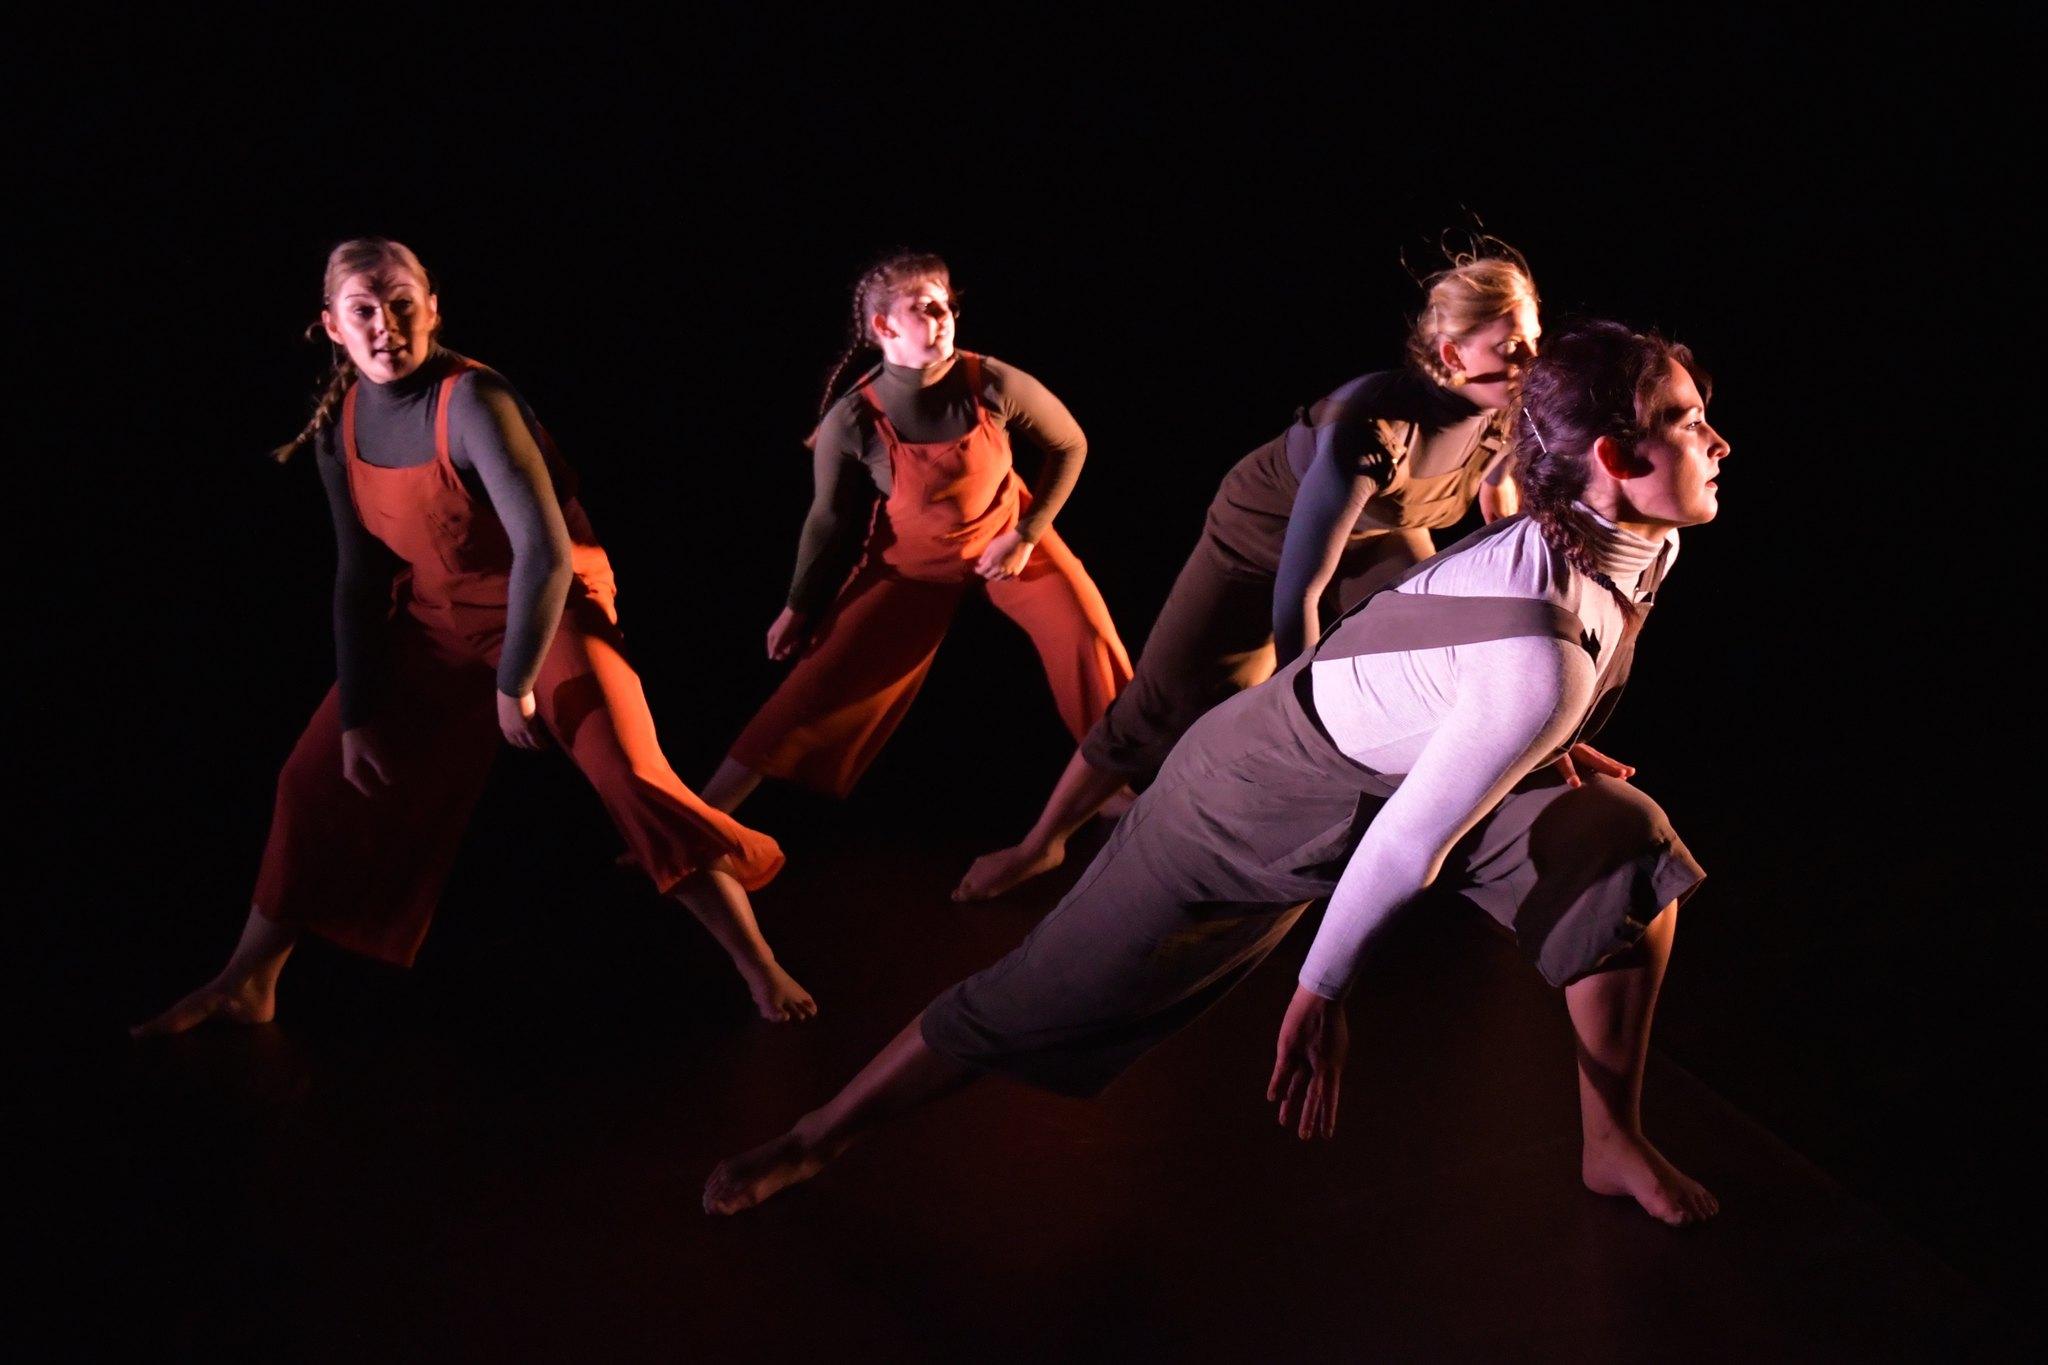 Transgression Hull Dance © Brian Slater